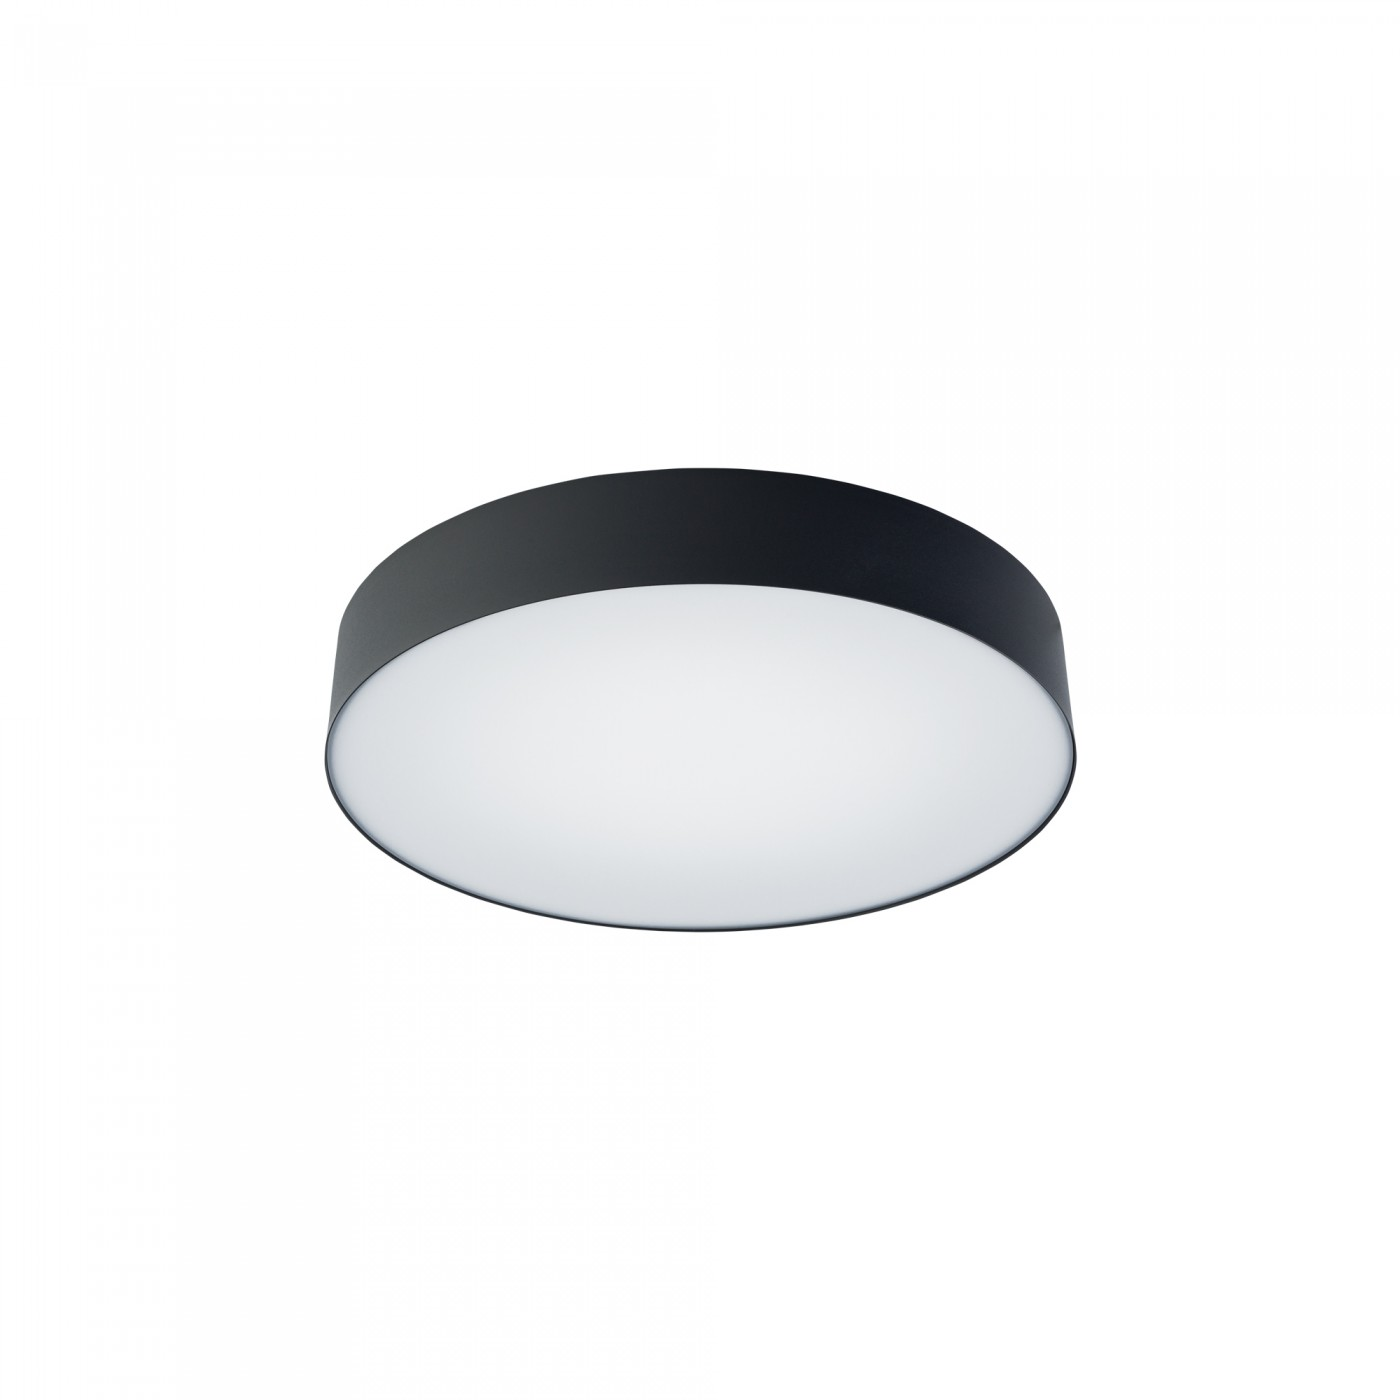 ARENA LED black 8274 Nowodvorski Lighting